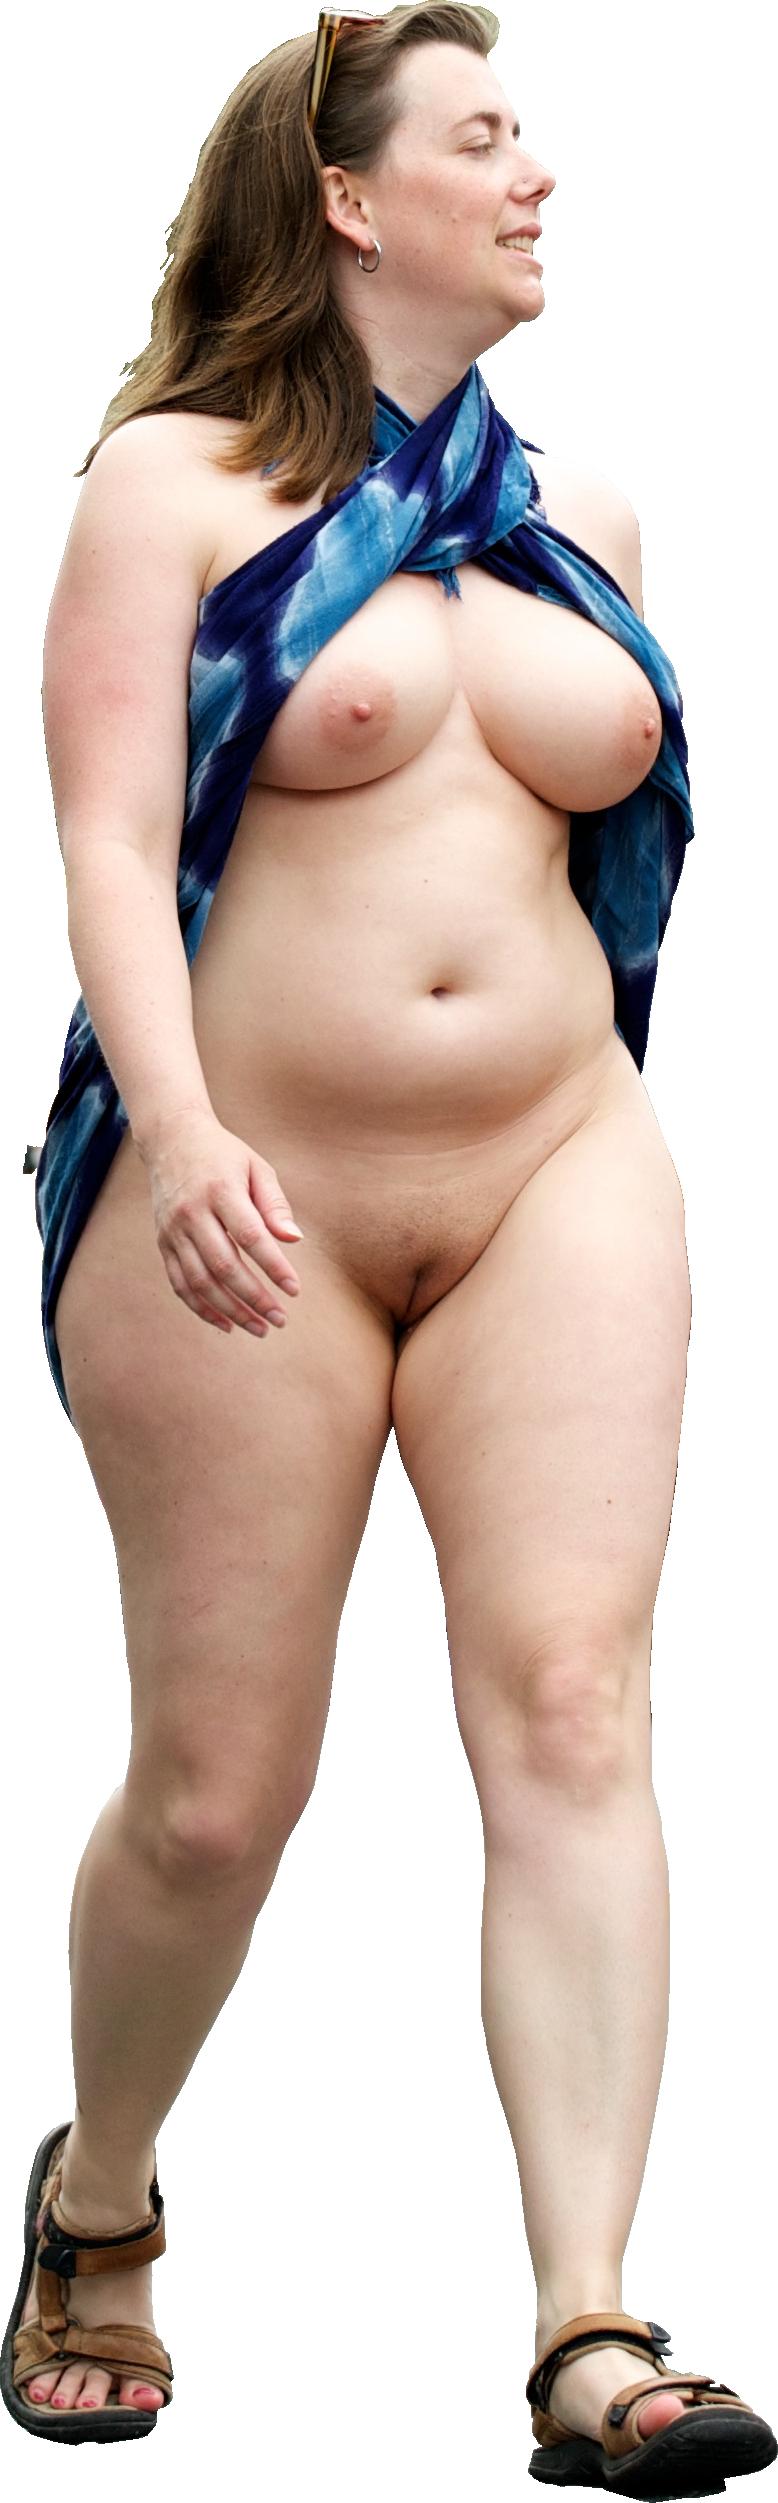 Png nude erotic gallery